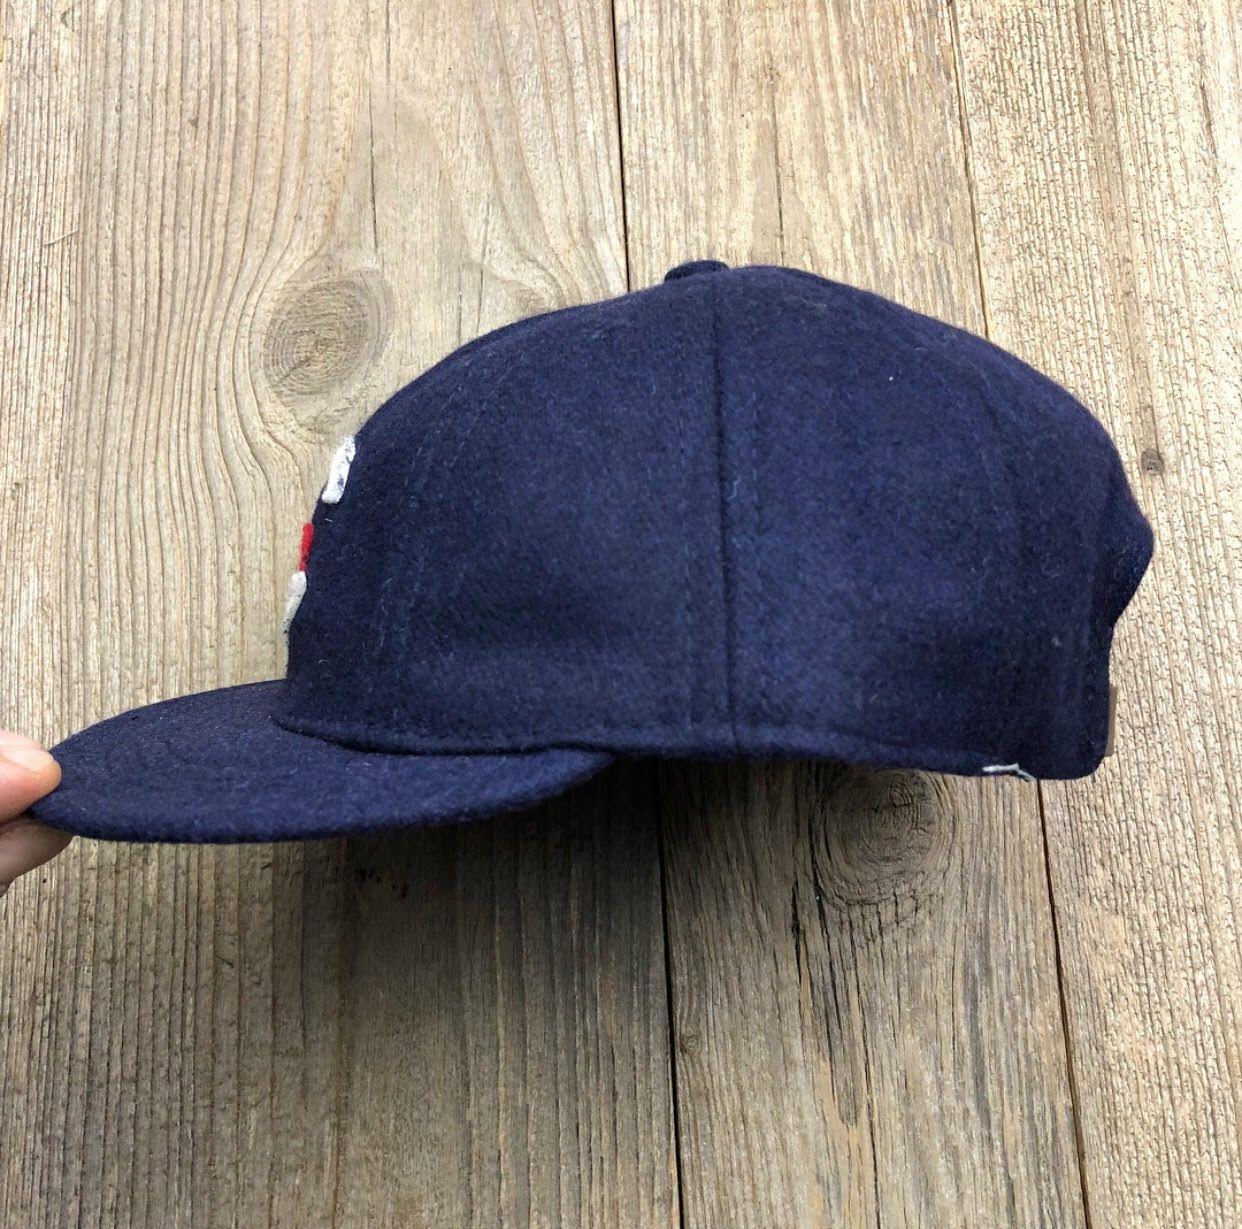 ca87e3ed1 Chicago Whales 1915 Vintage 8-Panel Ballcap | Vintage Ball Cap | Baseball  cap, Brooks england, Cap